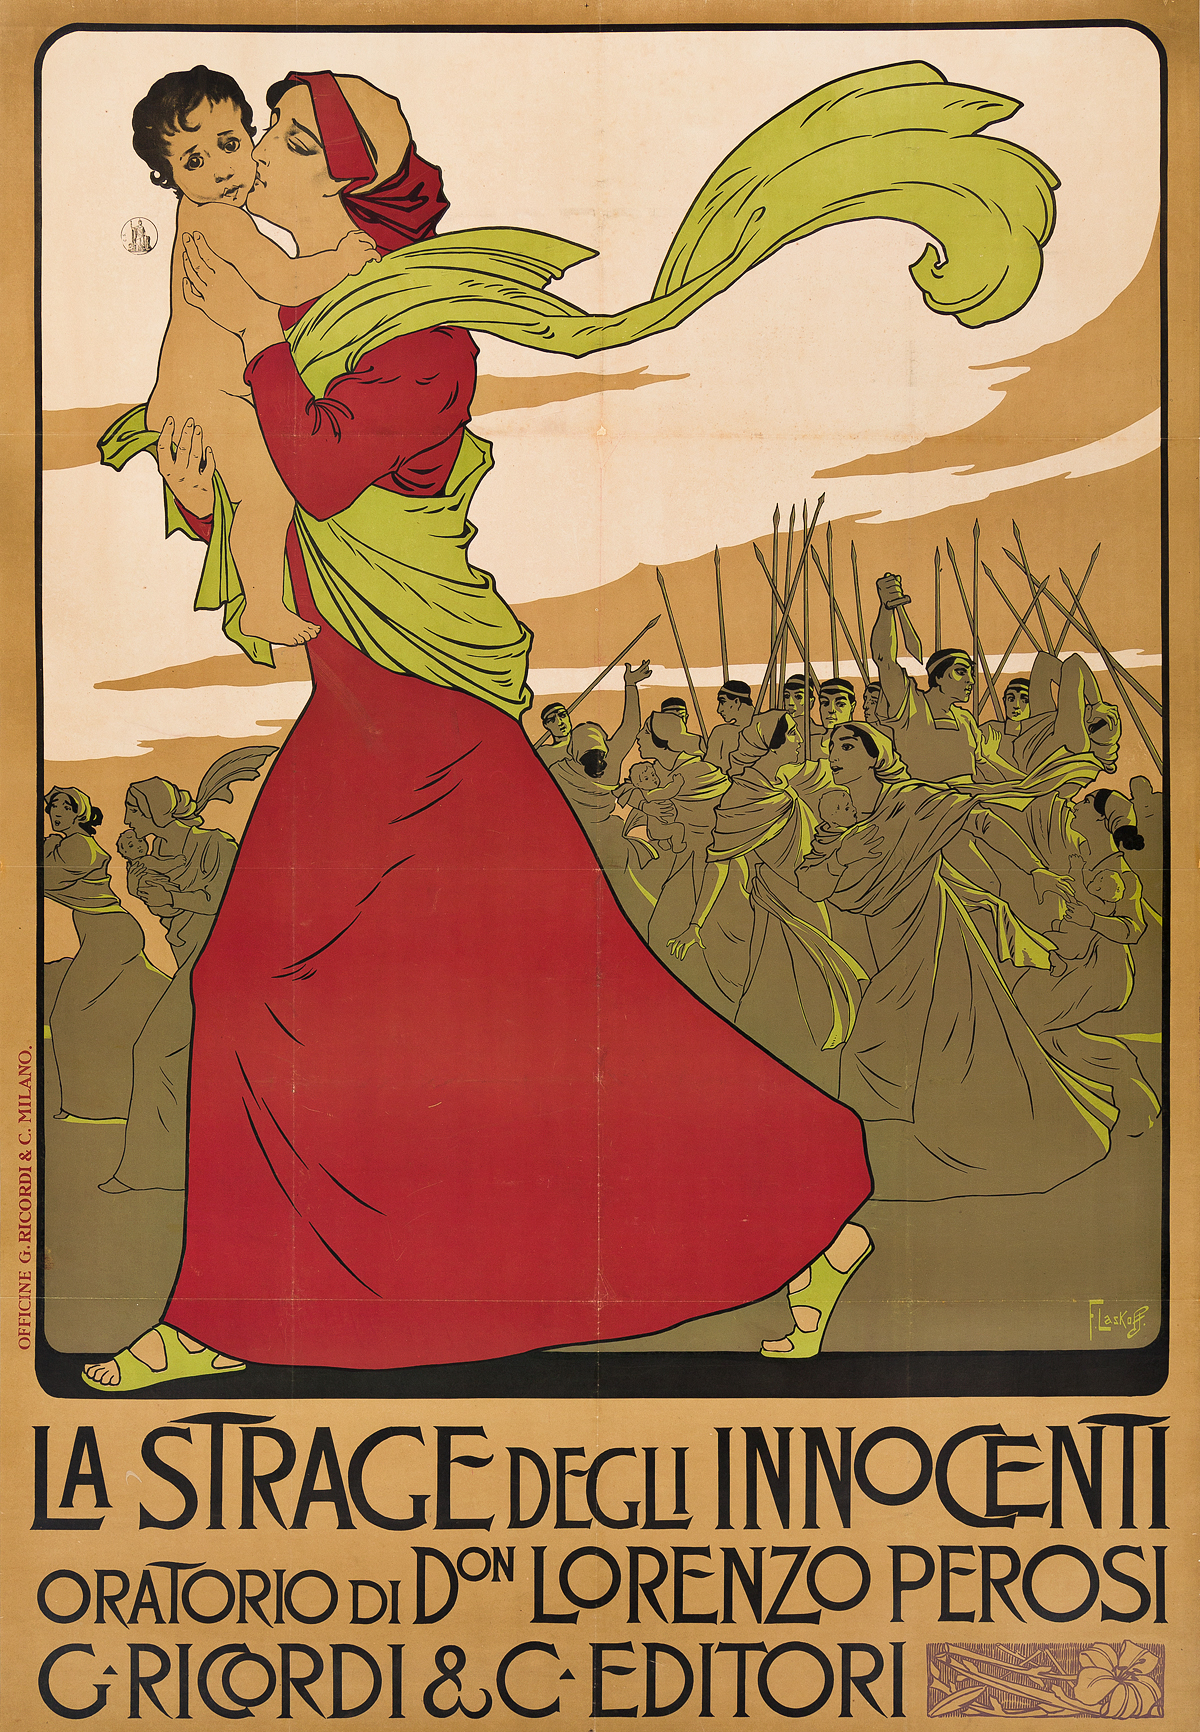 FRANZ-LASKOFF-(FRANCOIS-LASKOWSKI-1869-1921)-LA-STRAGE-DEGLI-INNOCENTI-Circa-1900-57x39-inches-145x100-cm-Ricordi--C-Milan